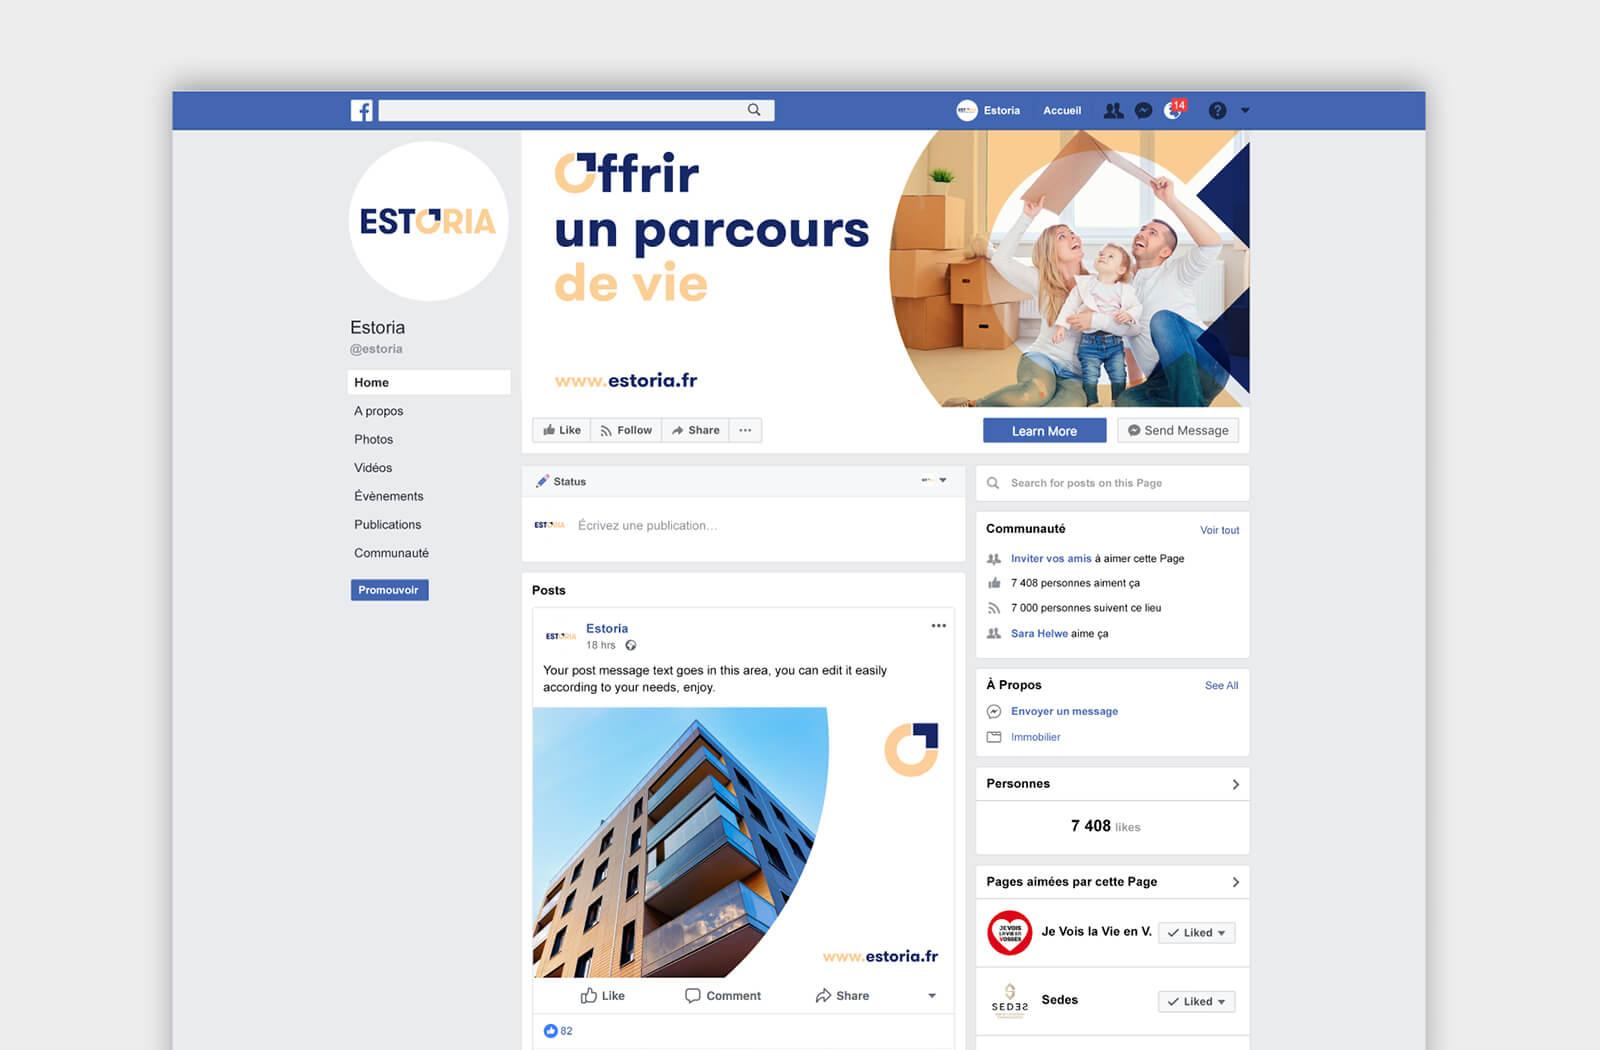 lezardscreation agence communication publicite vosges remiremont estoria lezards creation estoria facebook